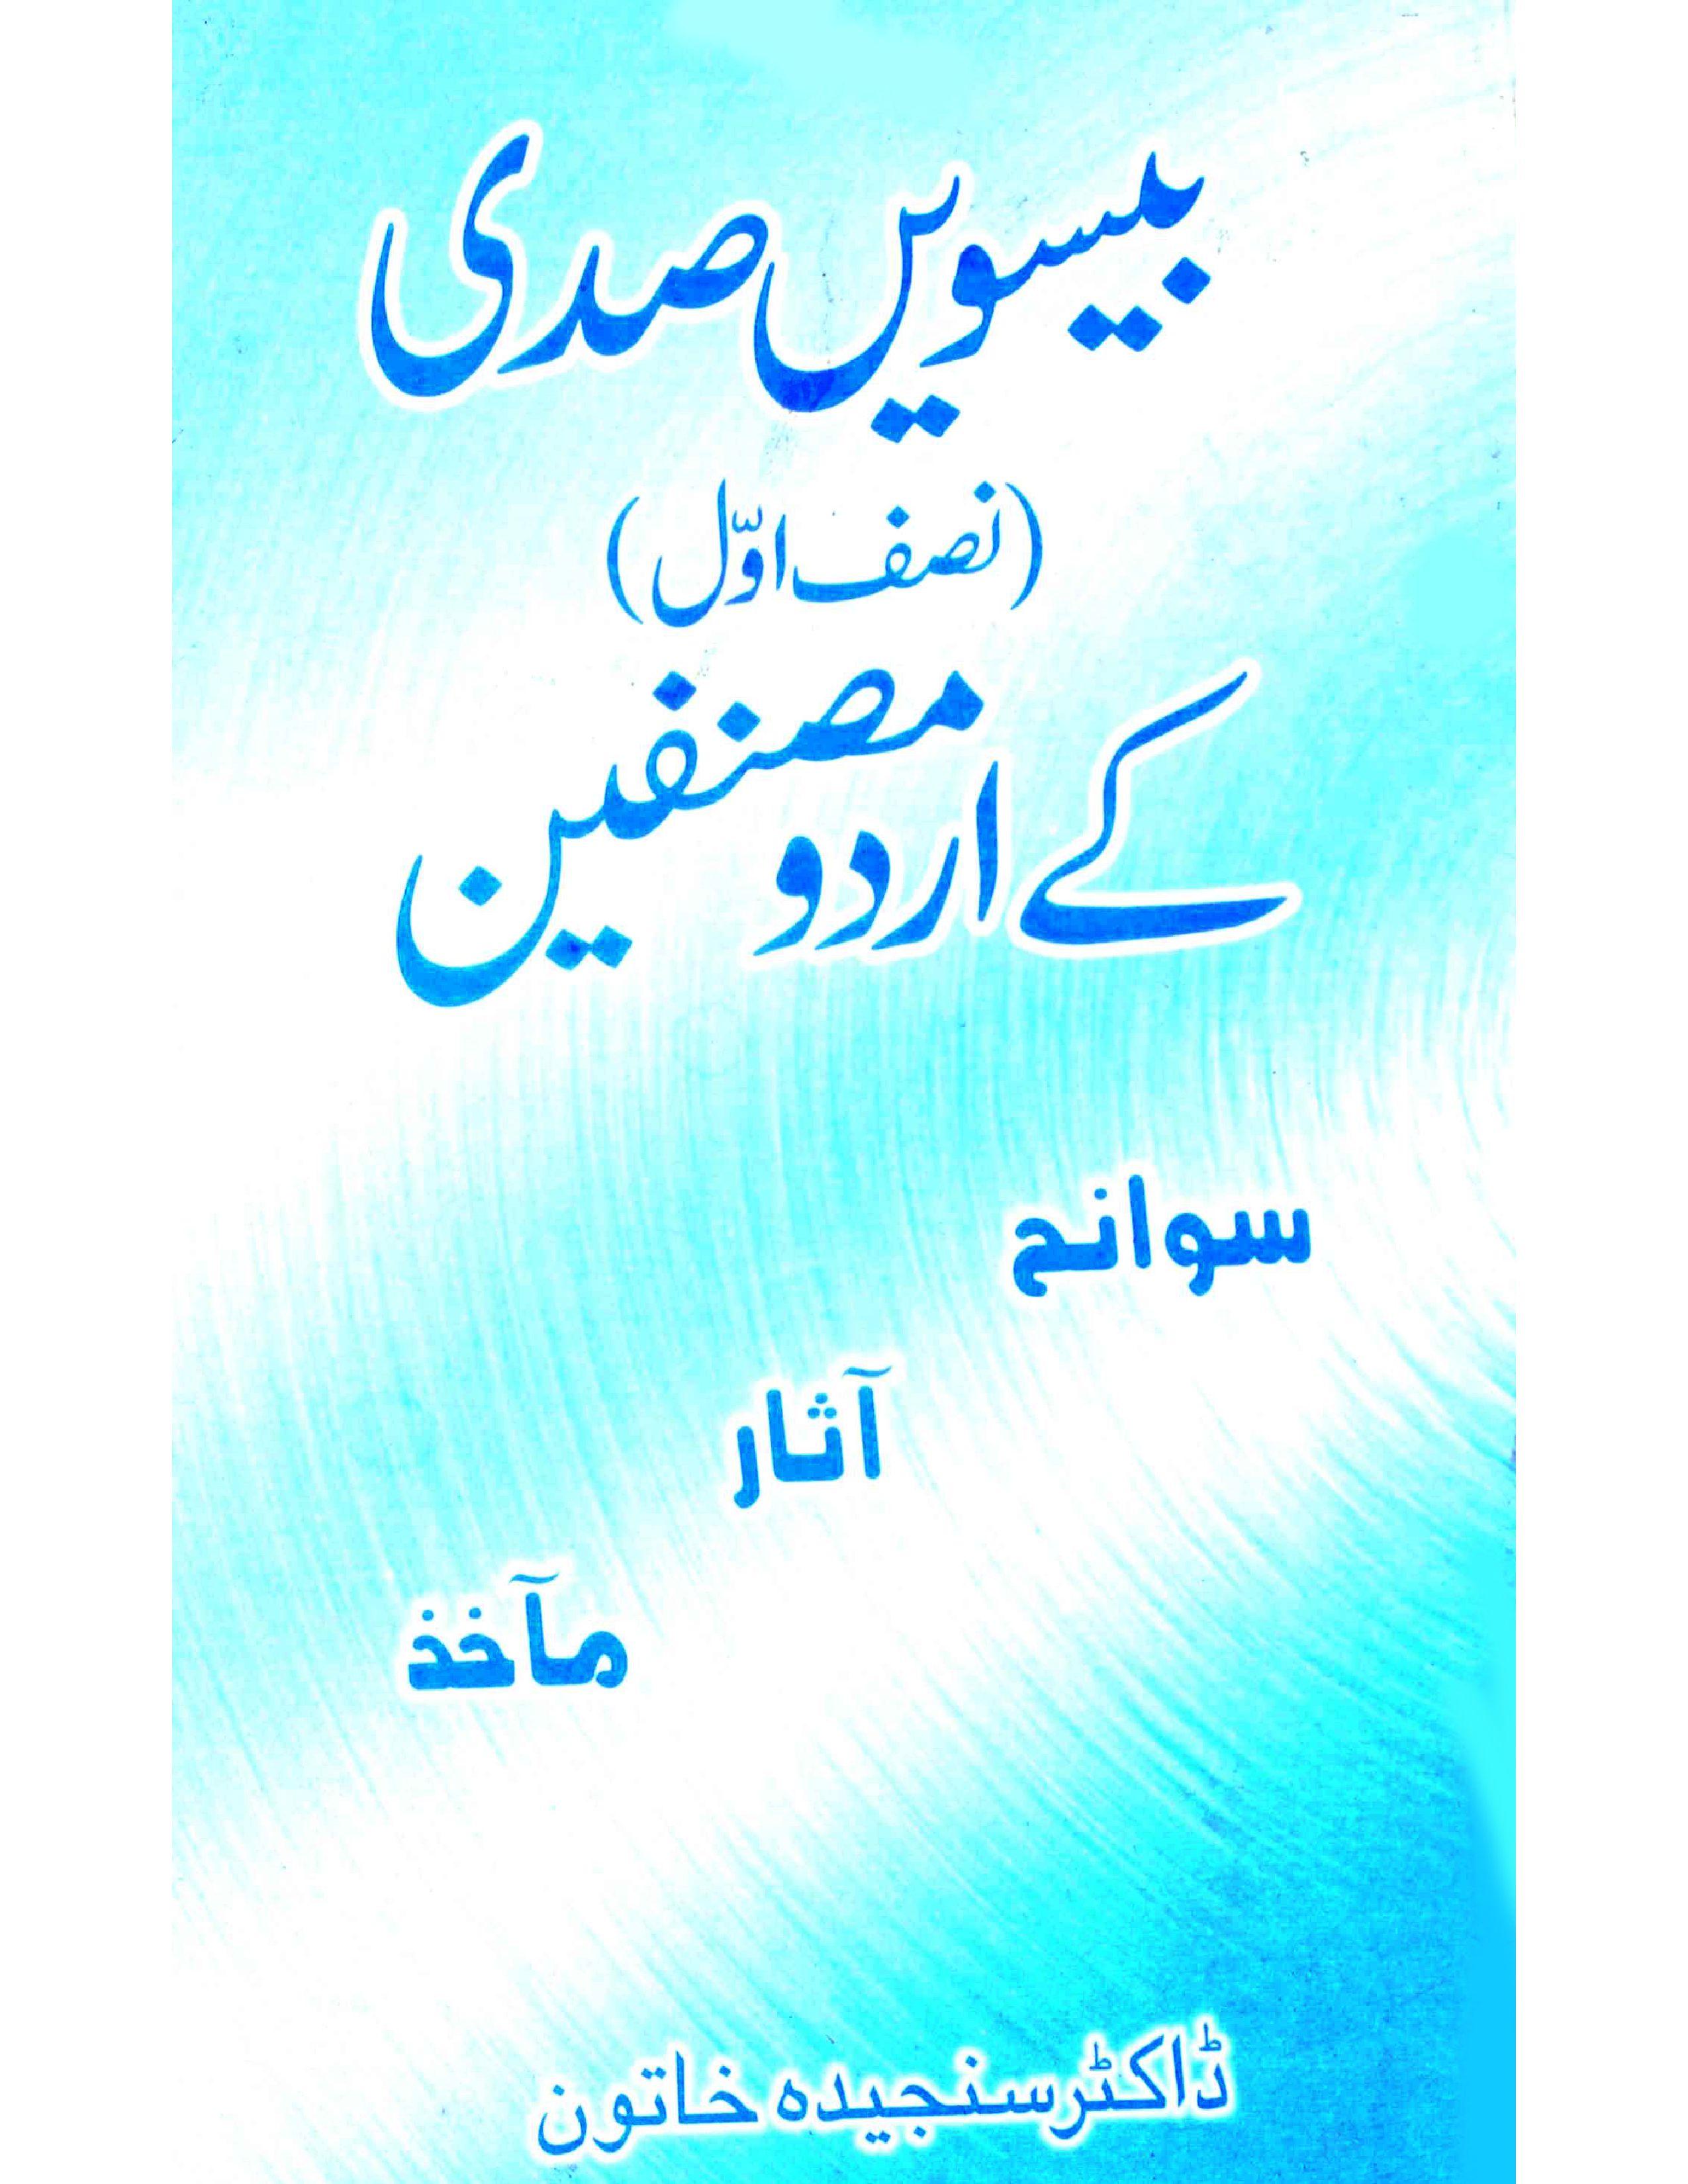 Beesween Sadi (Nisf Avval) Ke Urdu Musannifeen     Savaneh Aasar MaKhaz